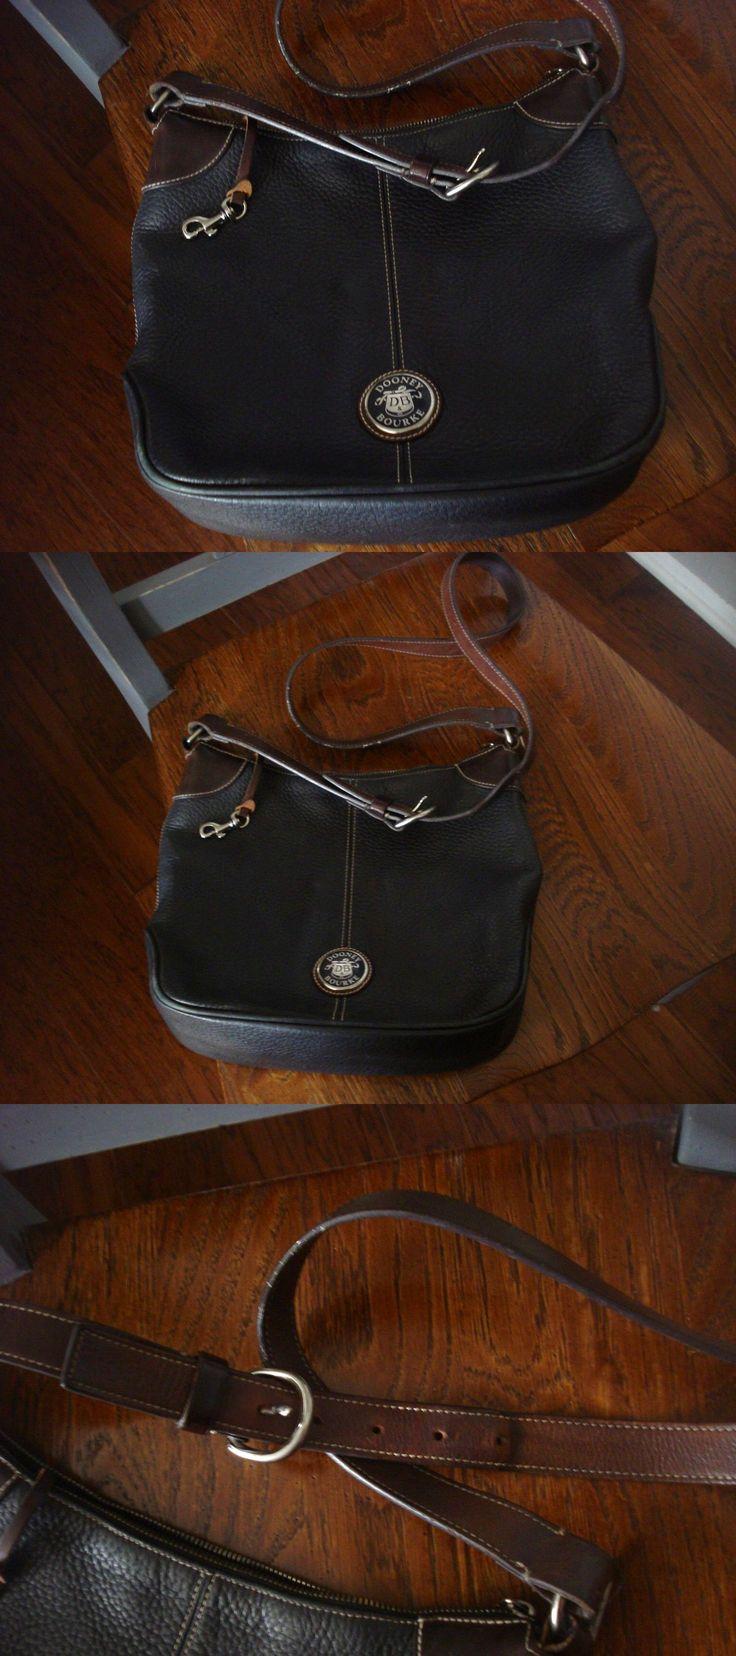 Dooney & Bourke Black Pebble All Weather Leather Bag Purse $24.95